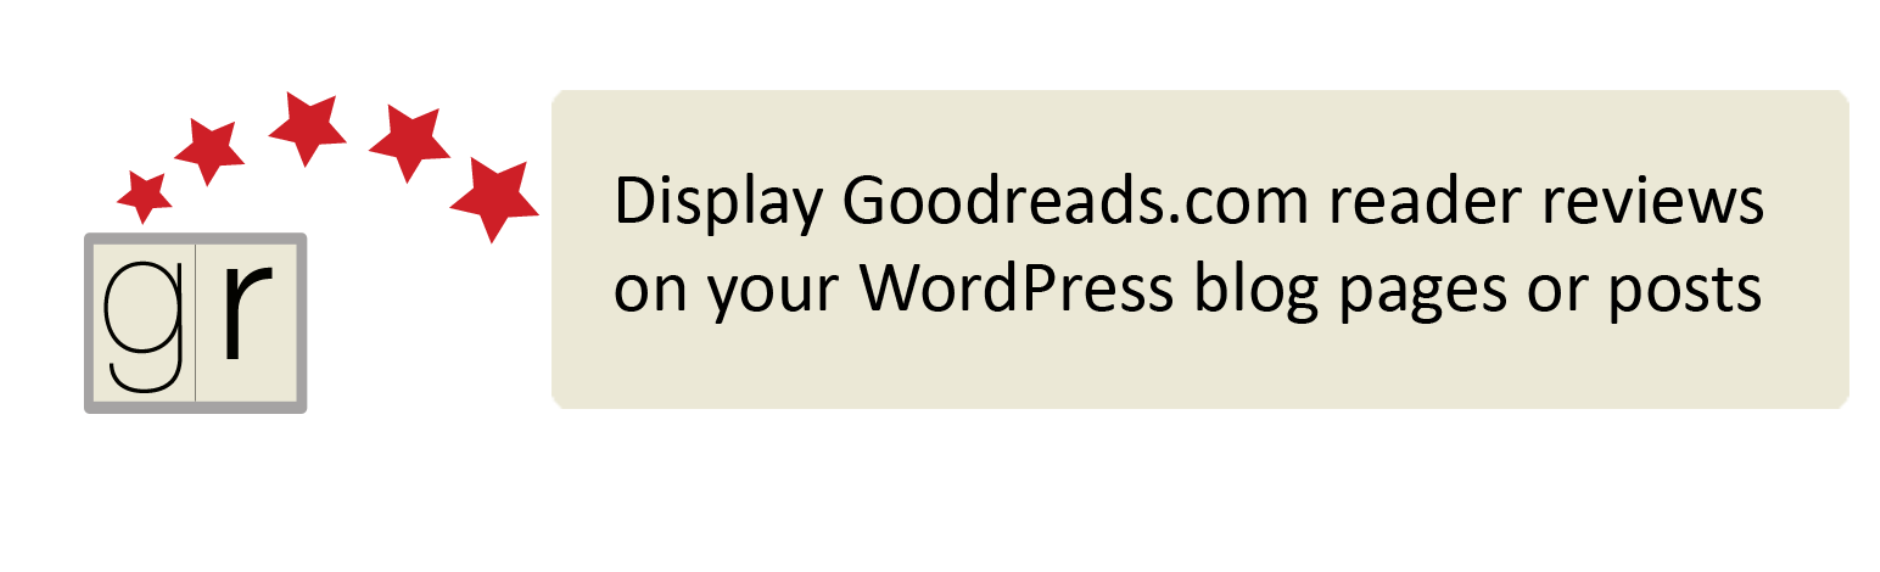 Good Reviews for WordPress